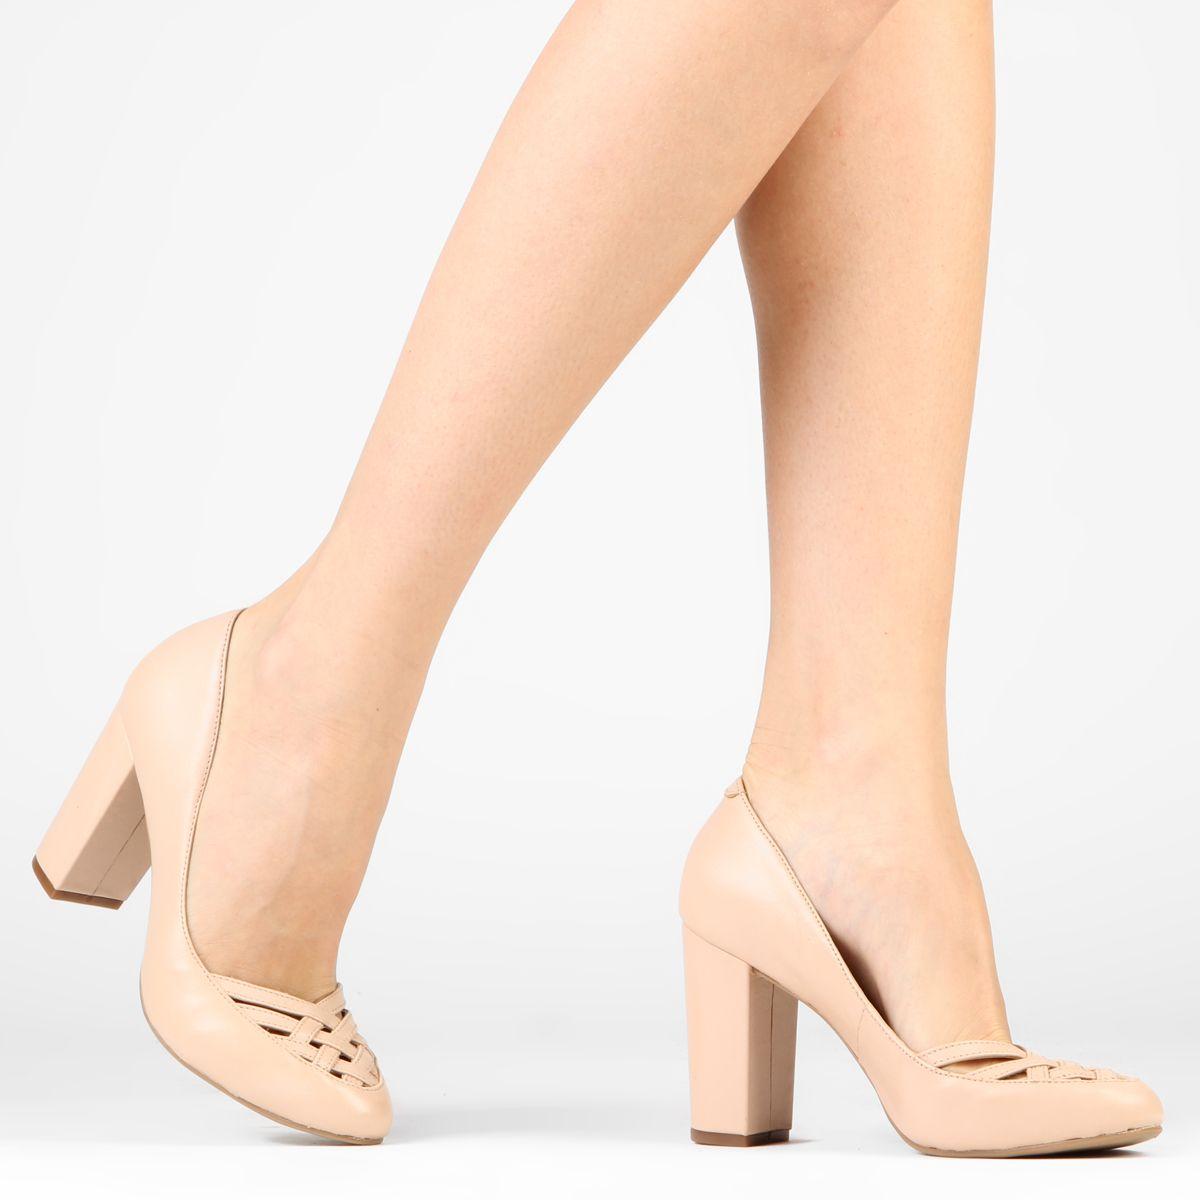 b24ea3f69 Scarpin Regina Rios Recortes Salto Grosso Nude | Zattini - A nova loja de  moda online da Netshoes